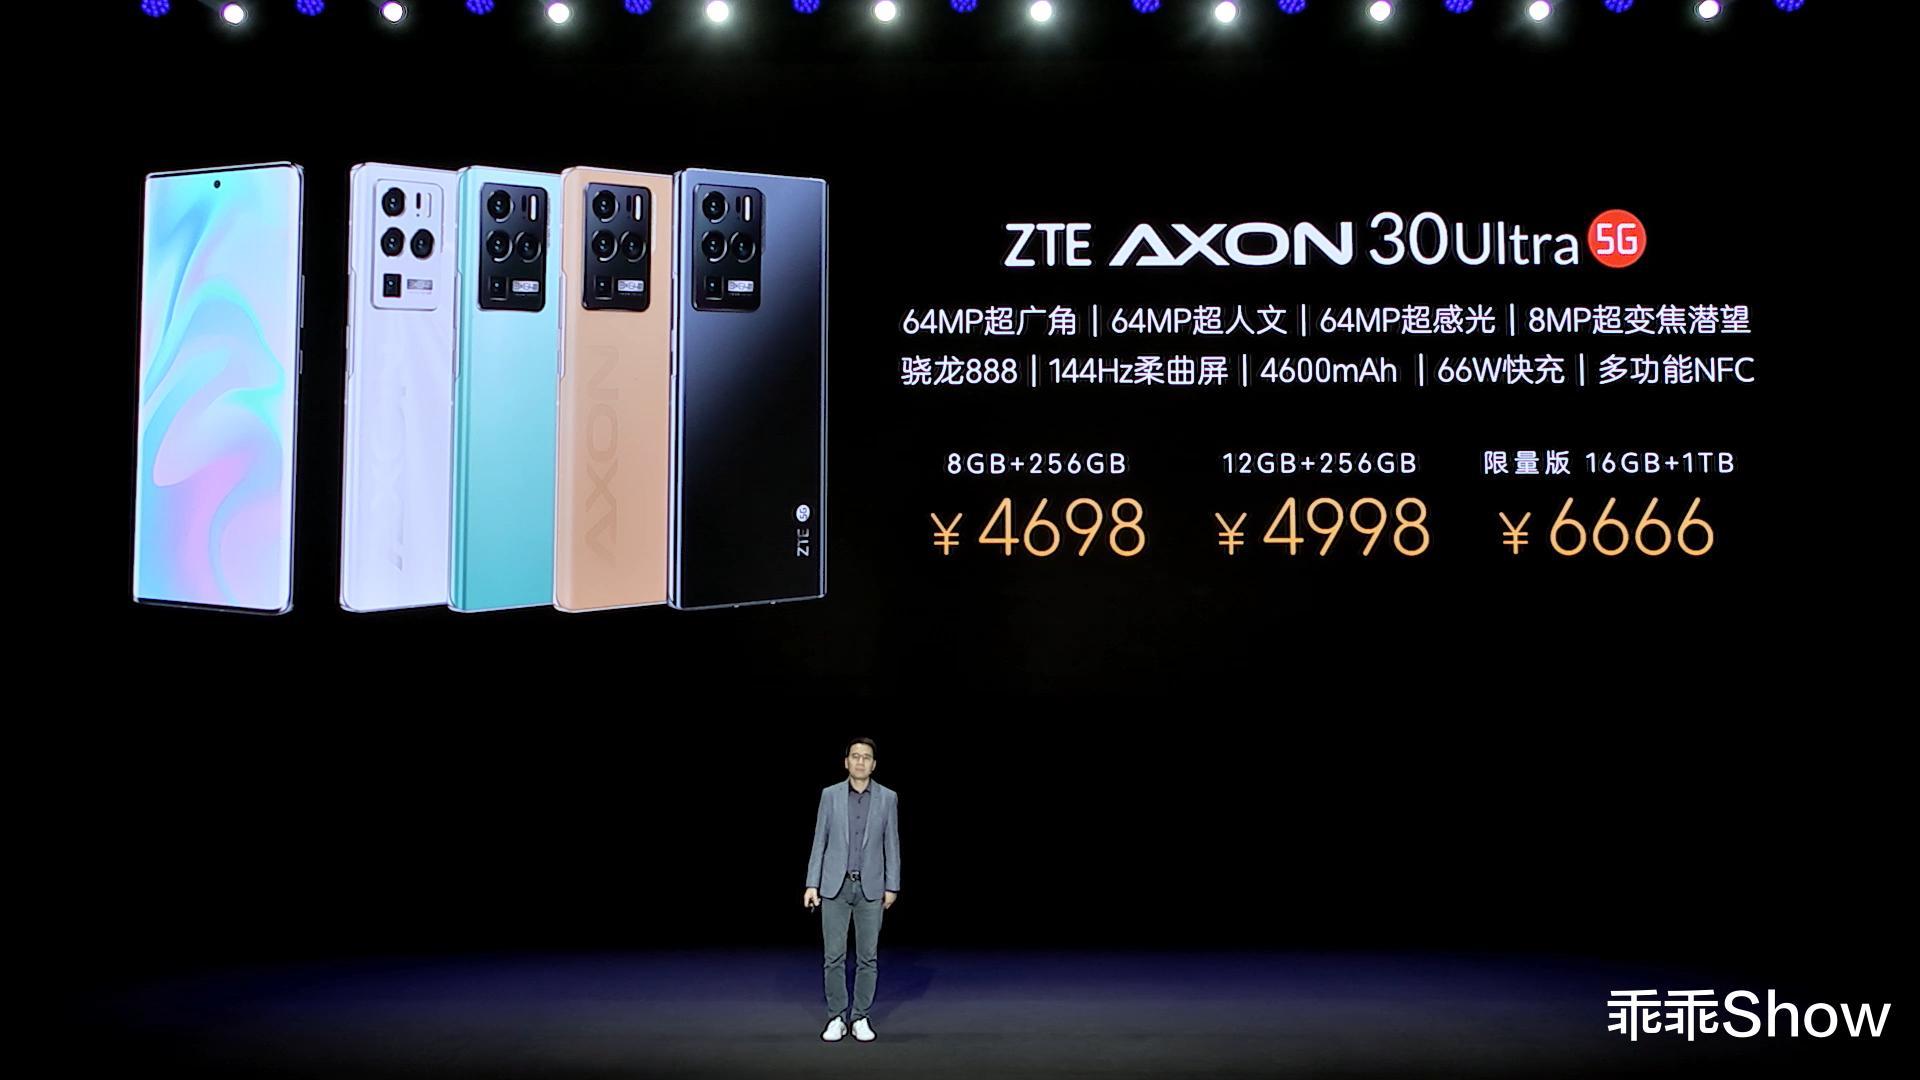 Axon 30双旗舰发布,技术实力派的中兴手机回来了,价格抢眼